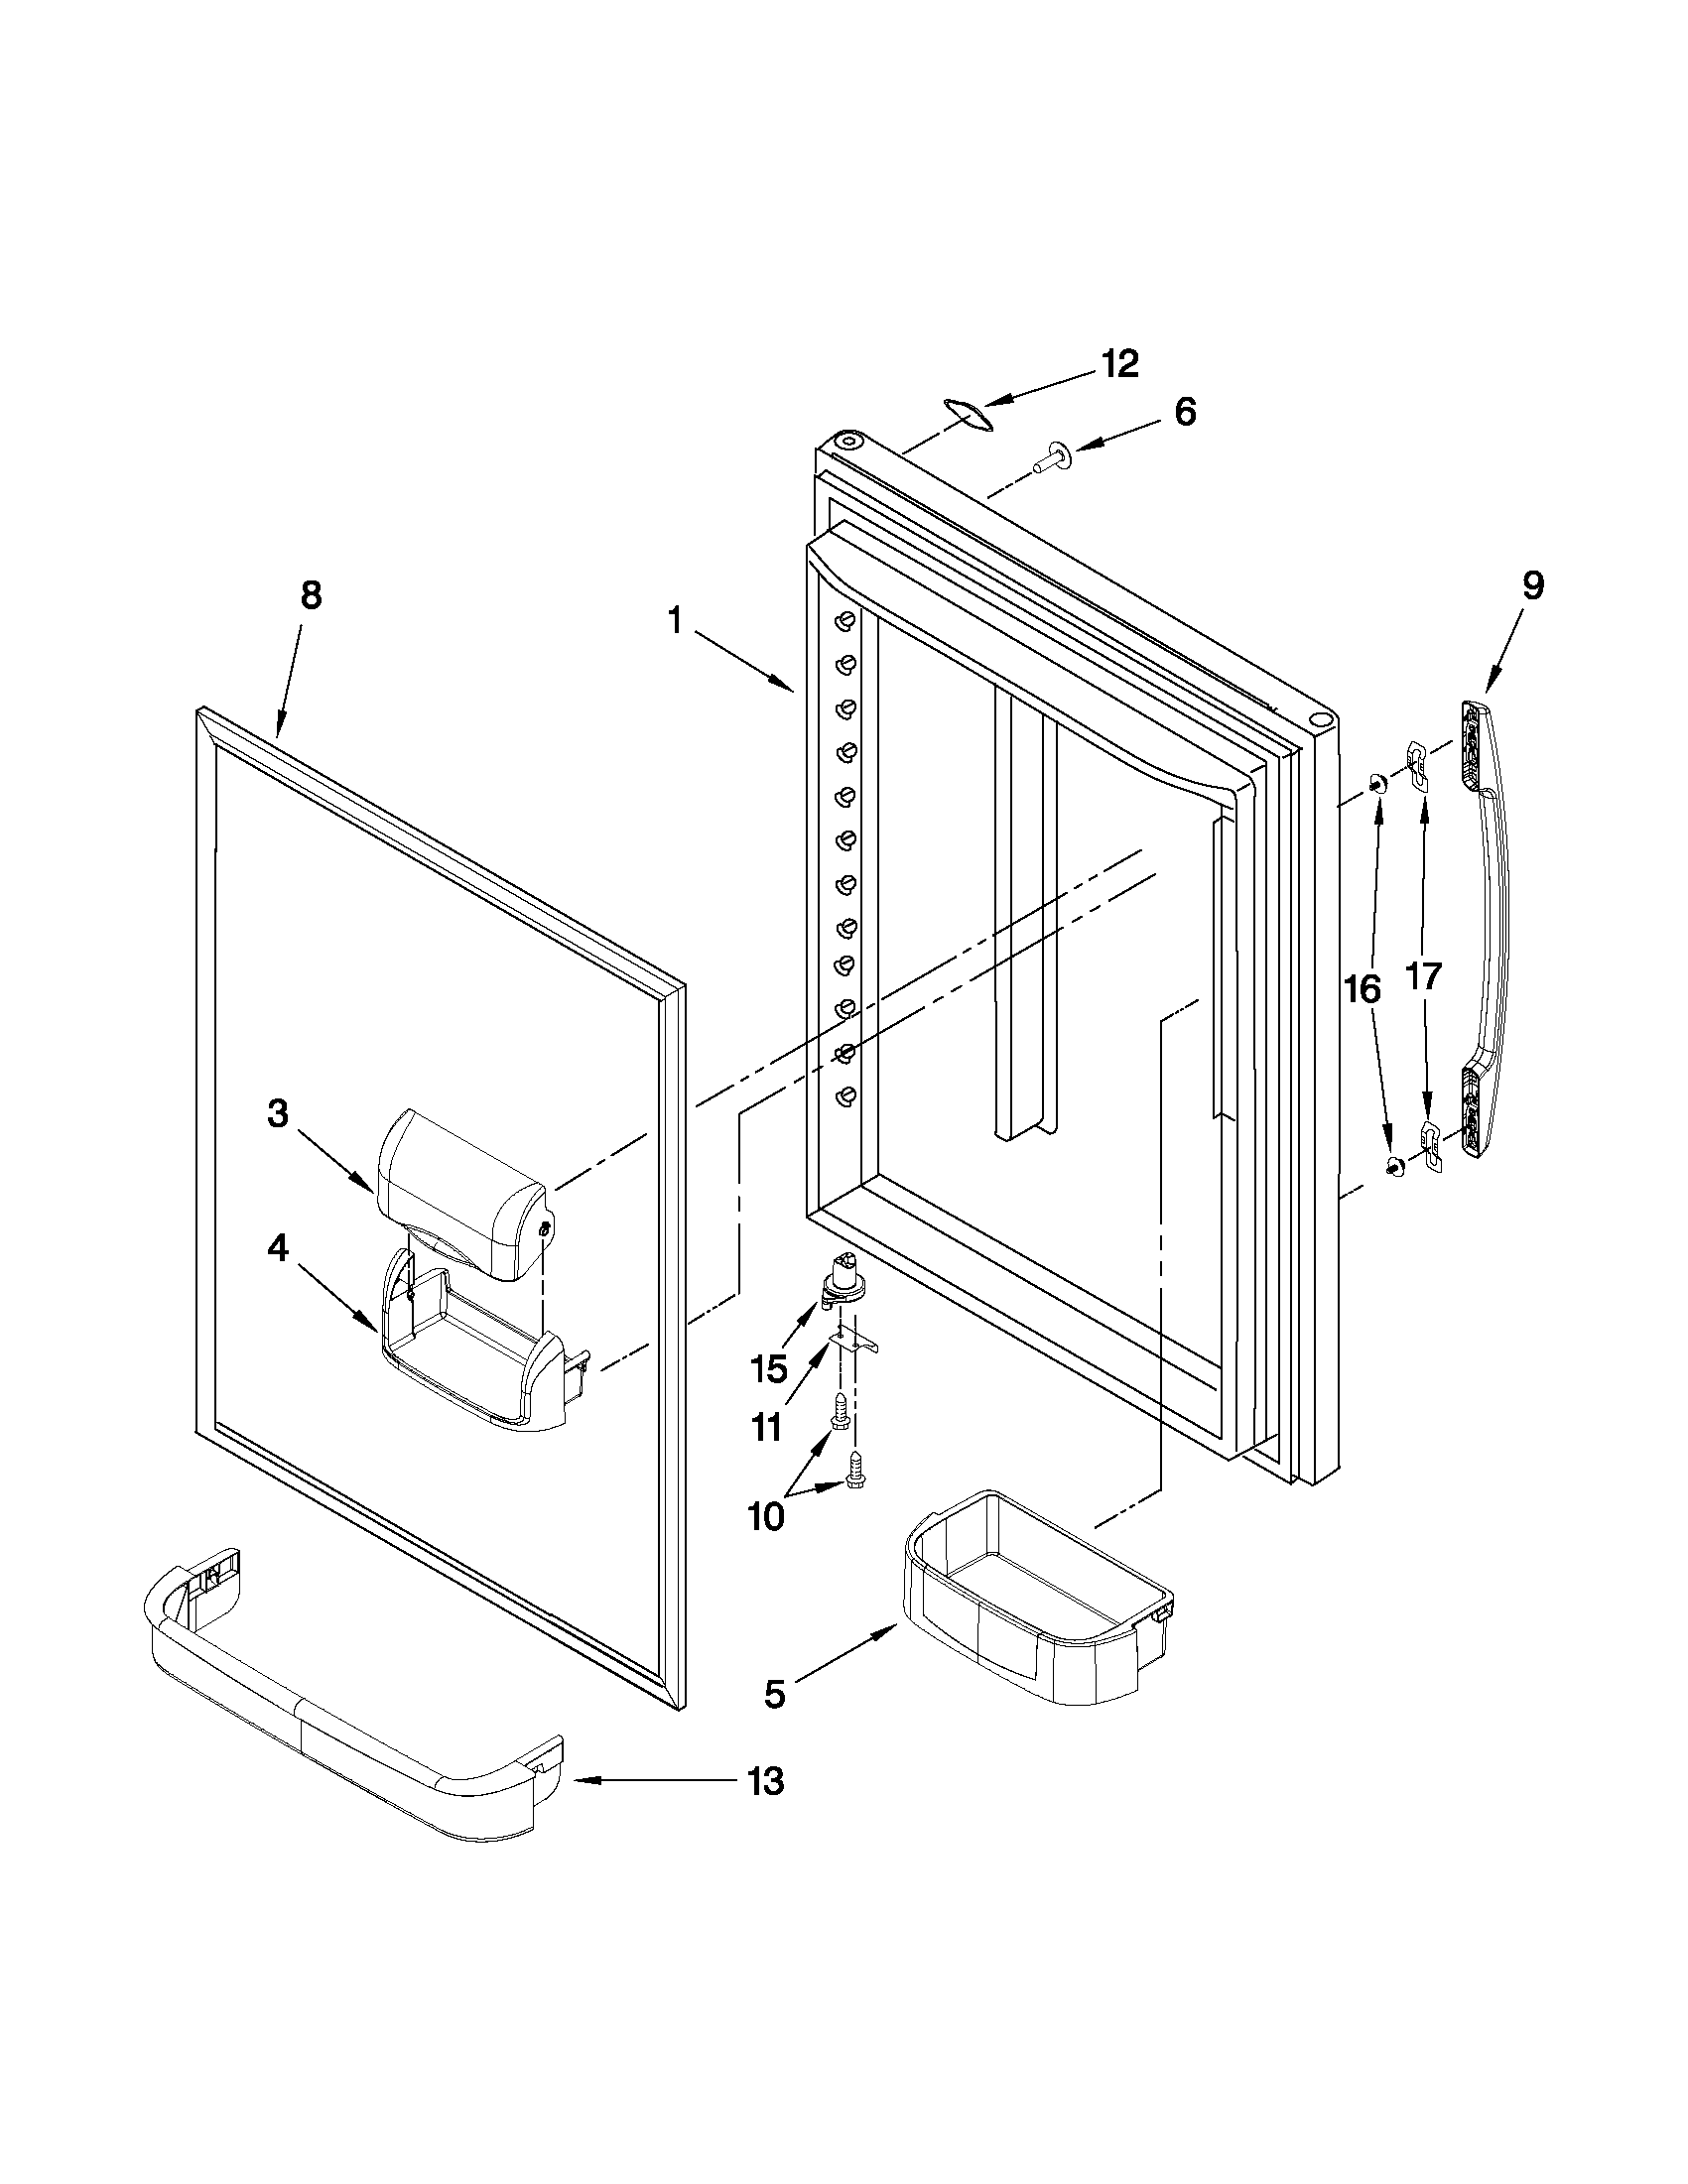 Maytag model MBF2258XEB1 bottom-mount refrigerator genuine